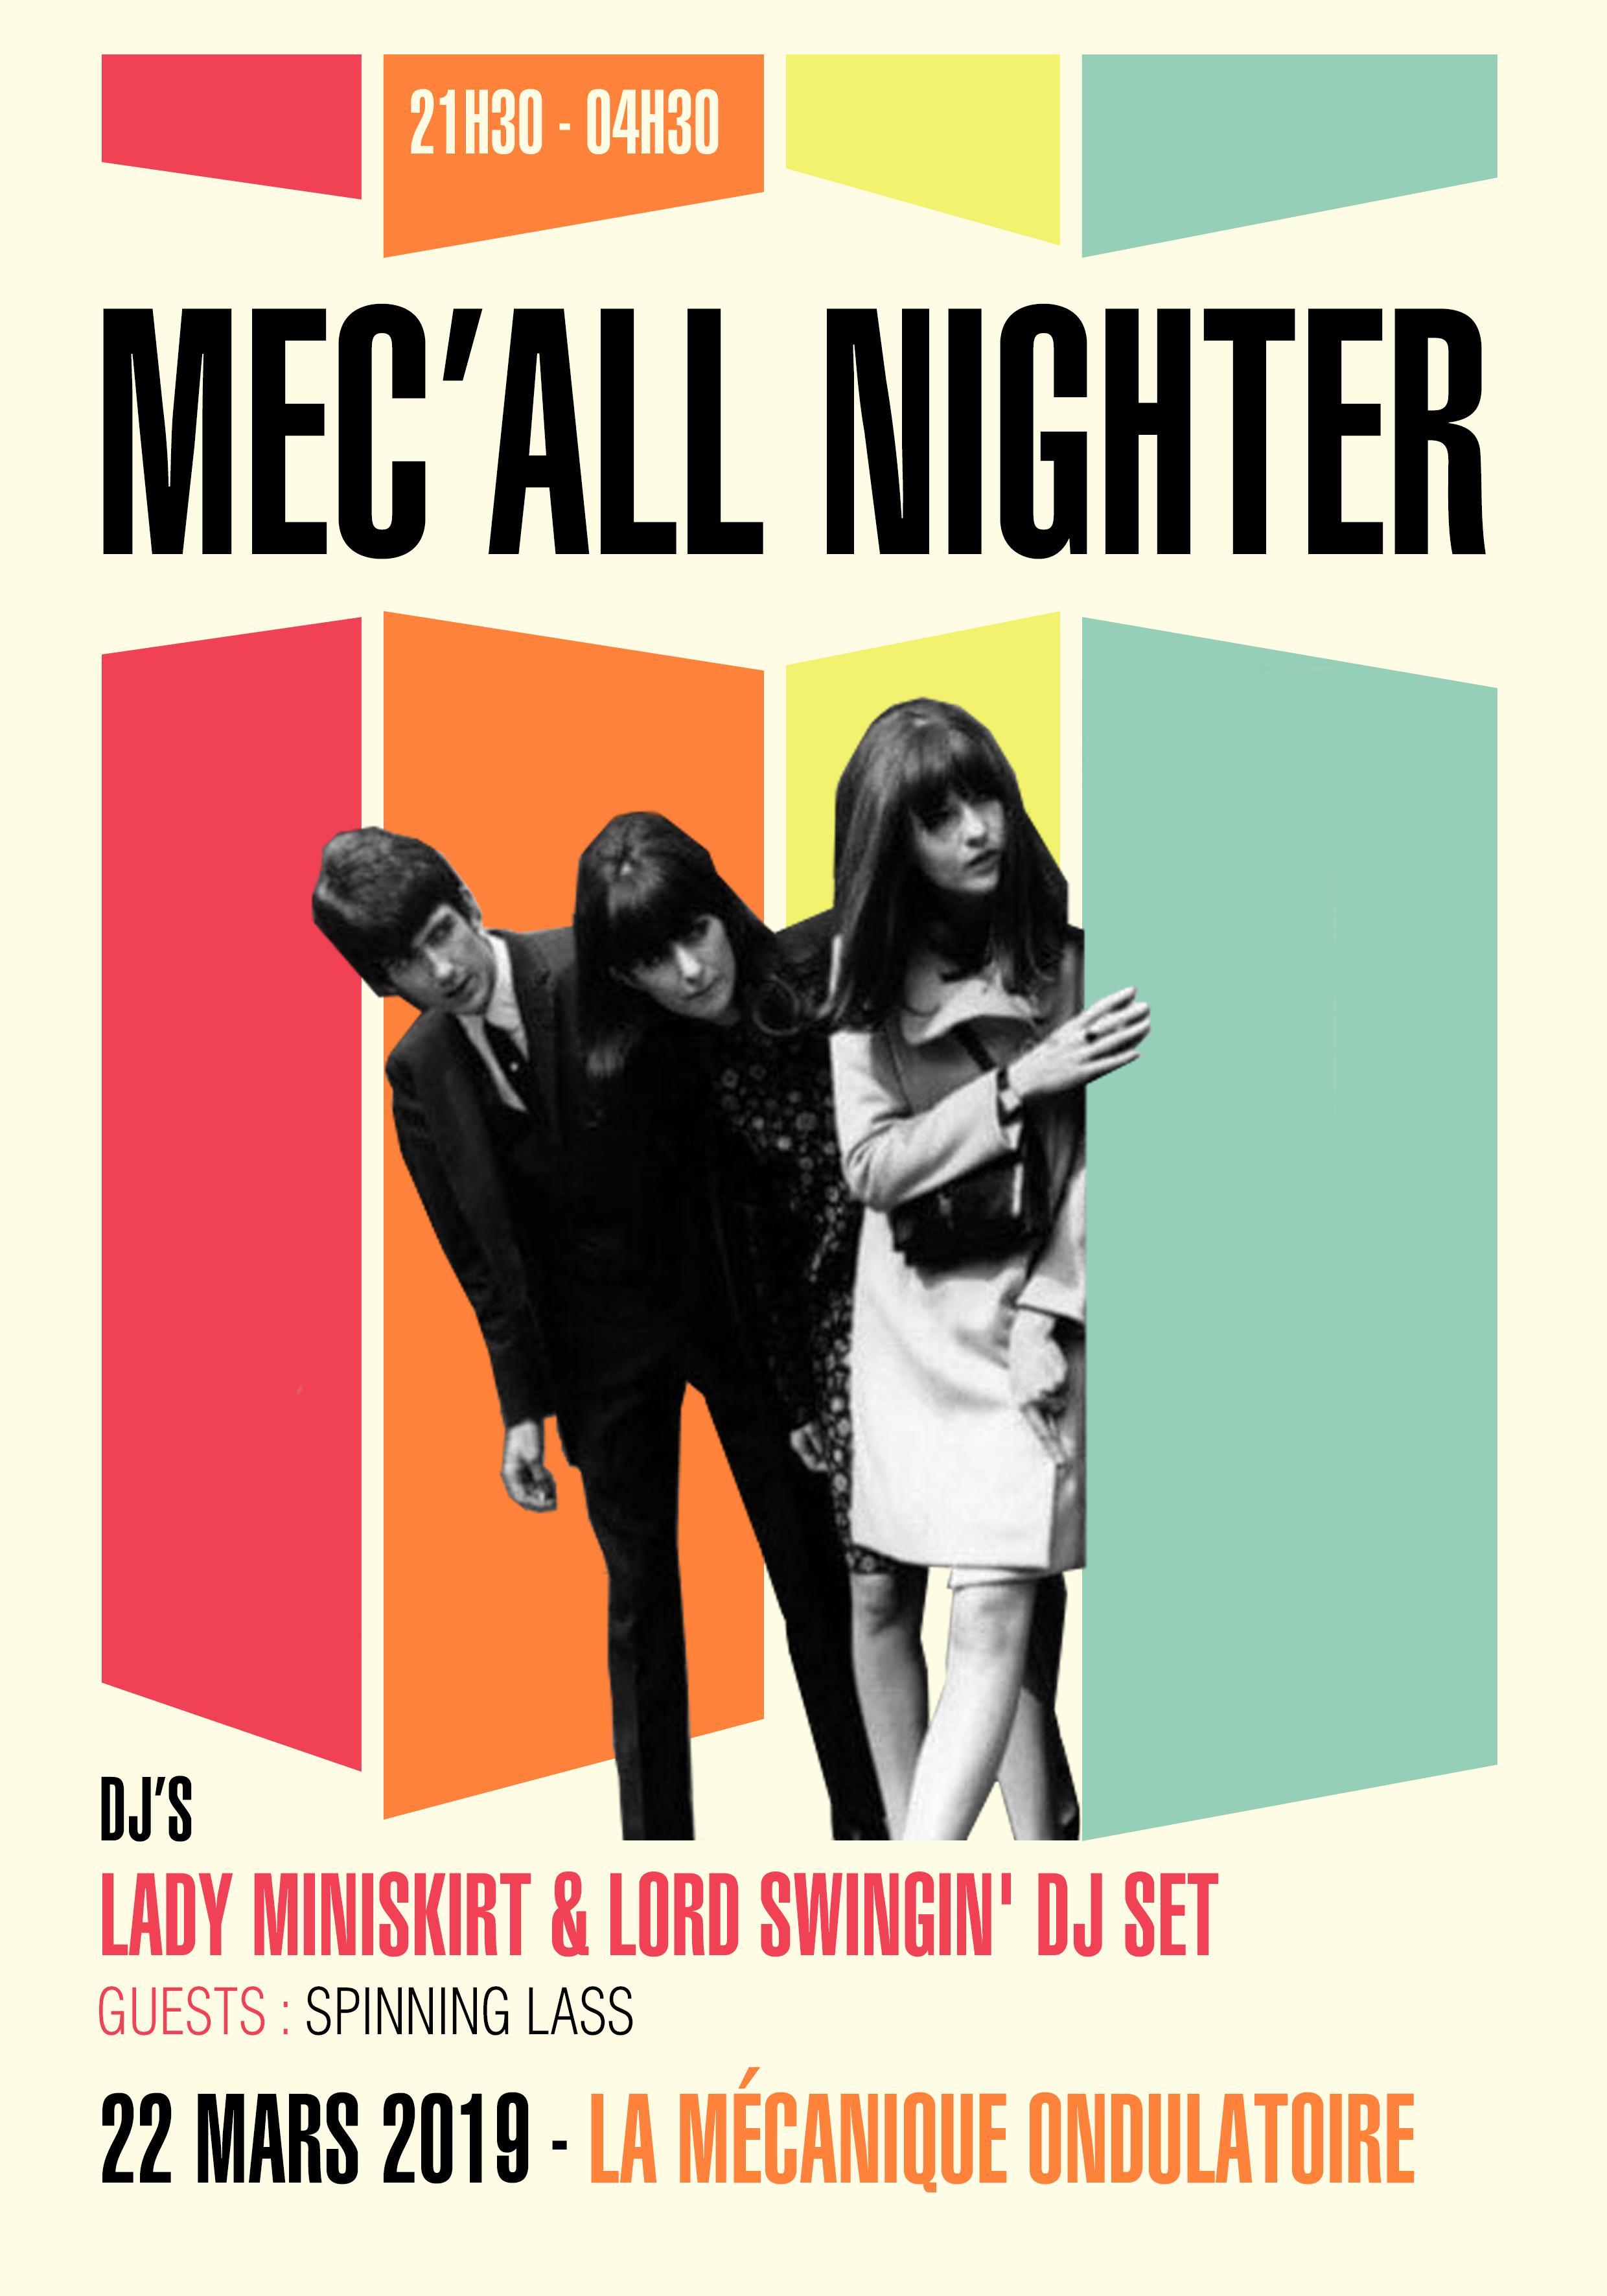 MEC'ALL NIGHTER #2 : Lady Miniskirt & Lord Swingin' & More